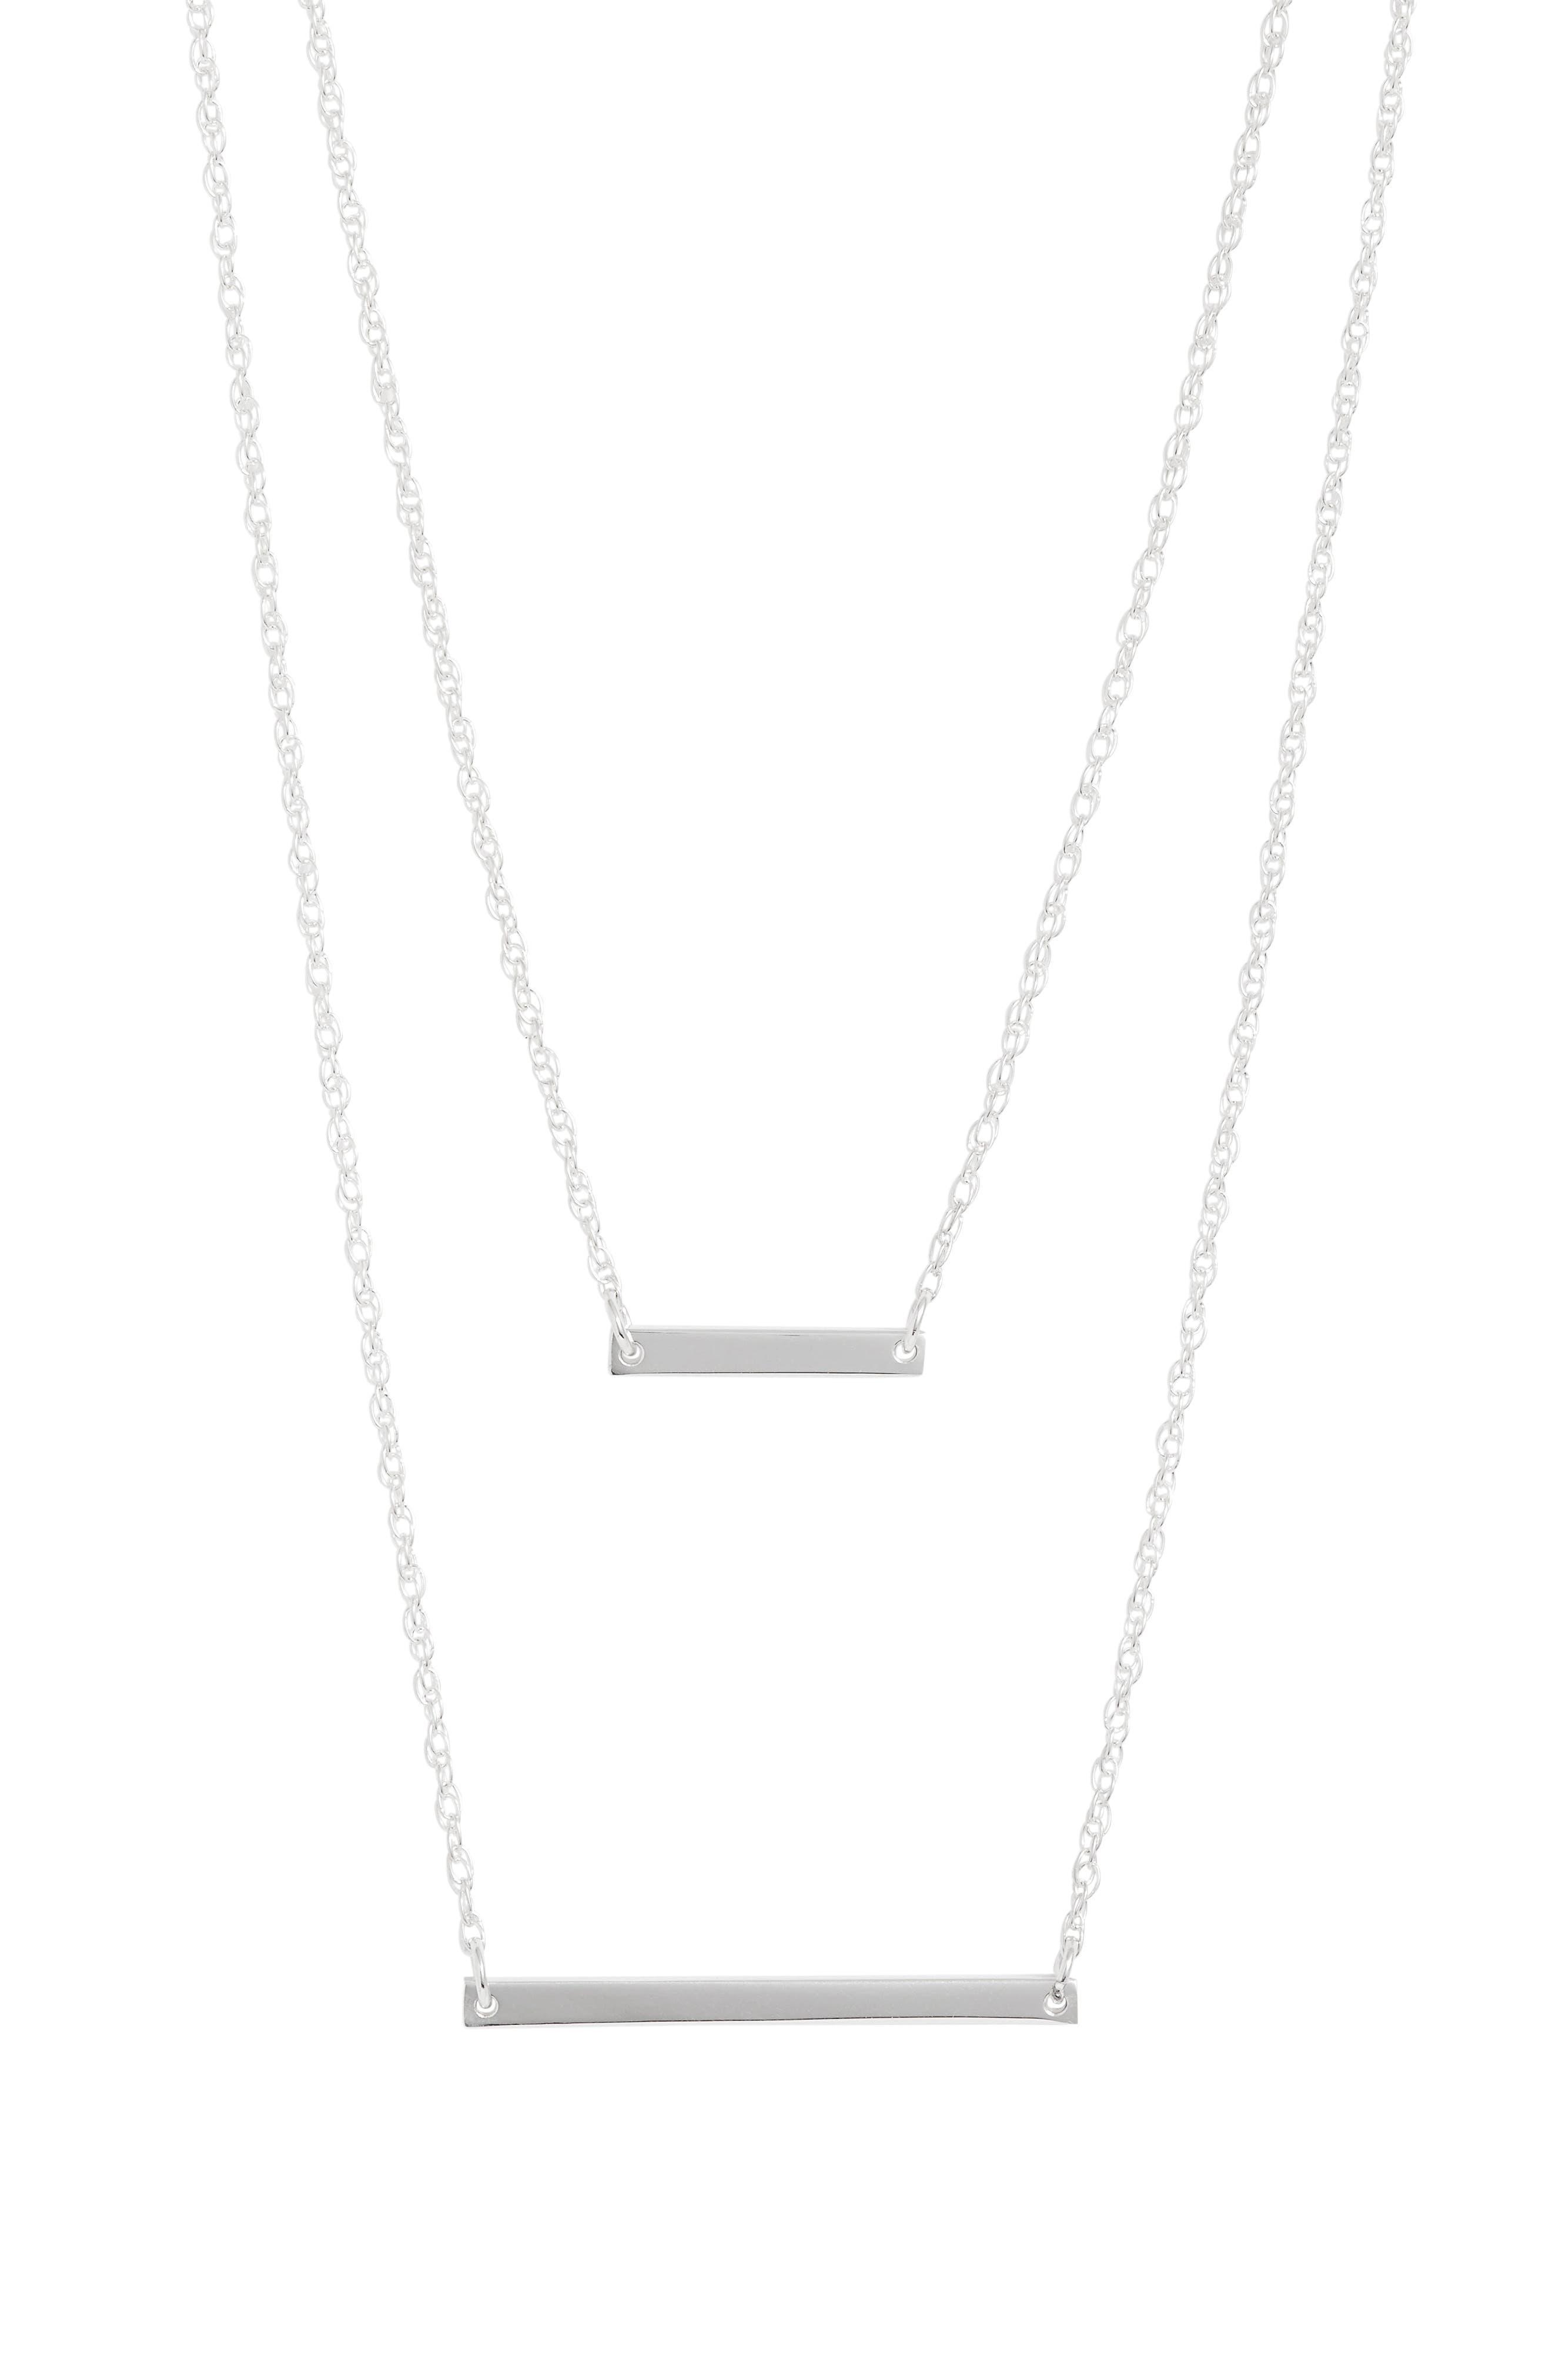 Cynthia Layered Pendant Necklace,                             Main thumbnail 1, color,                             SILVER